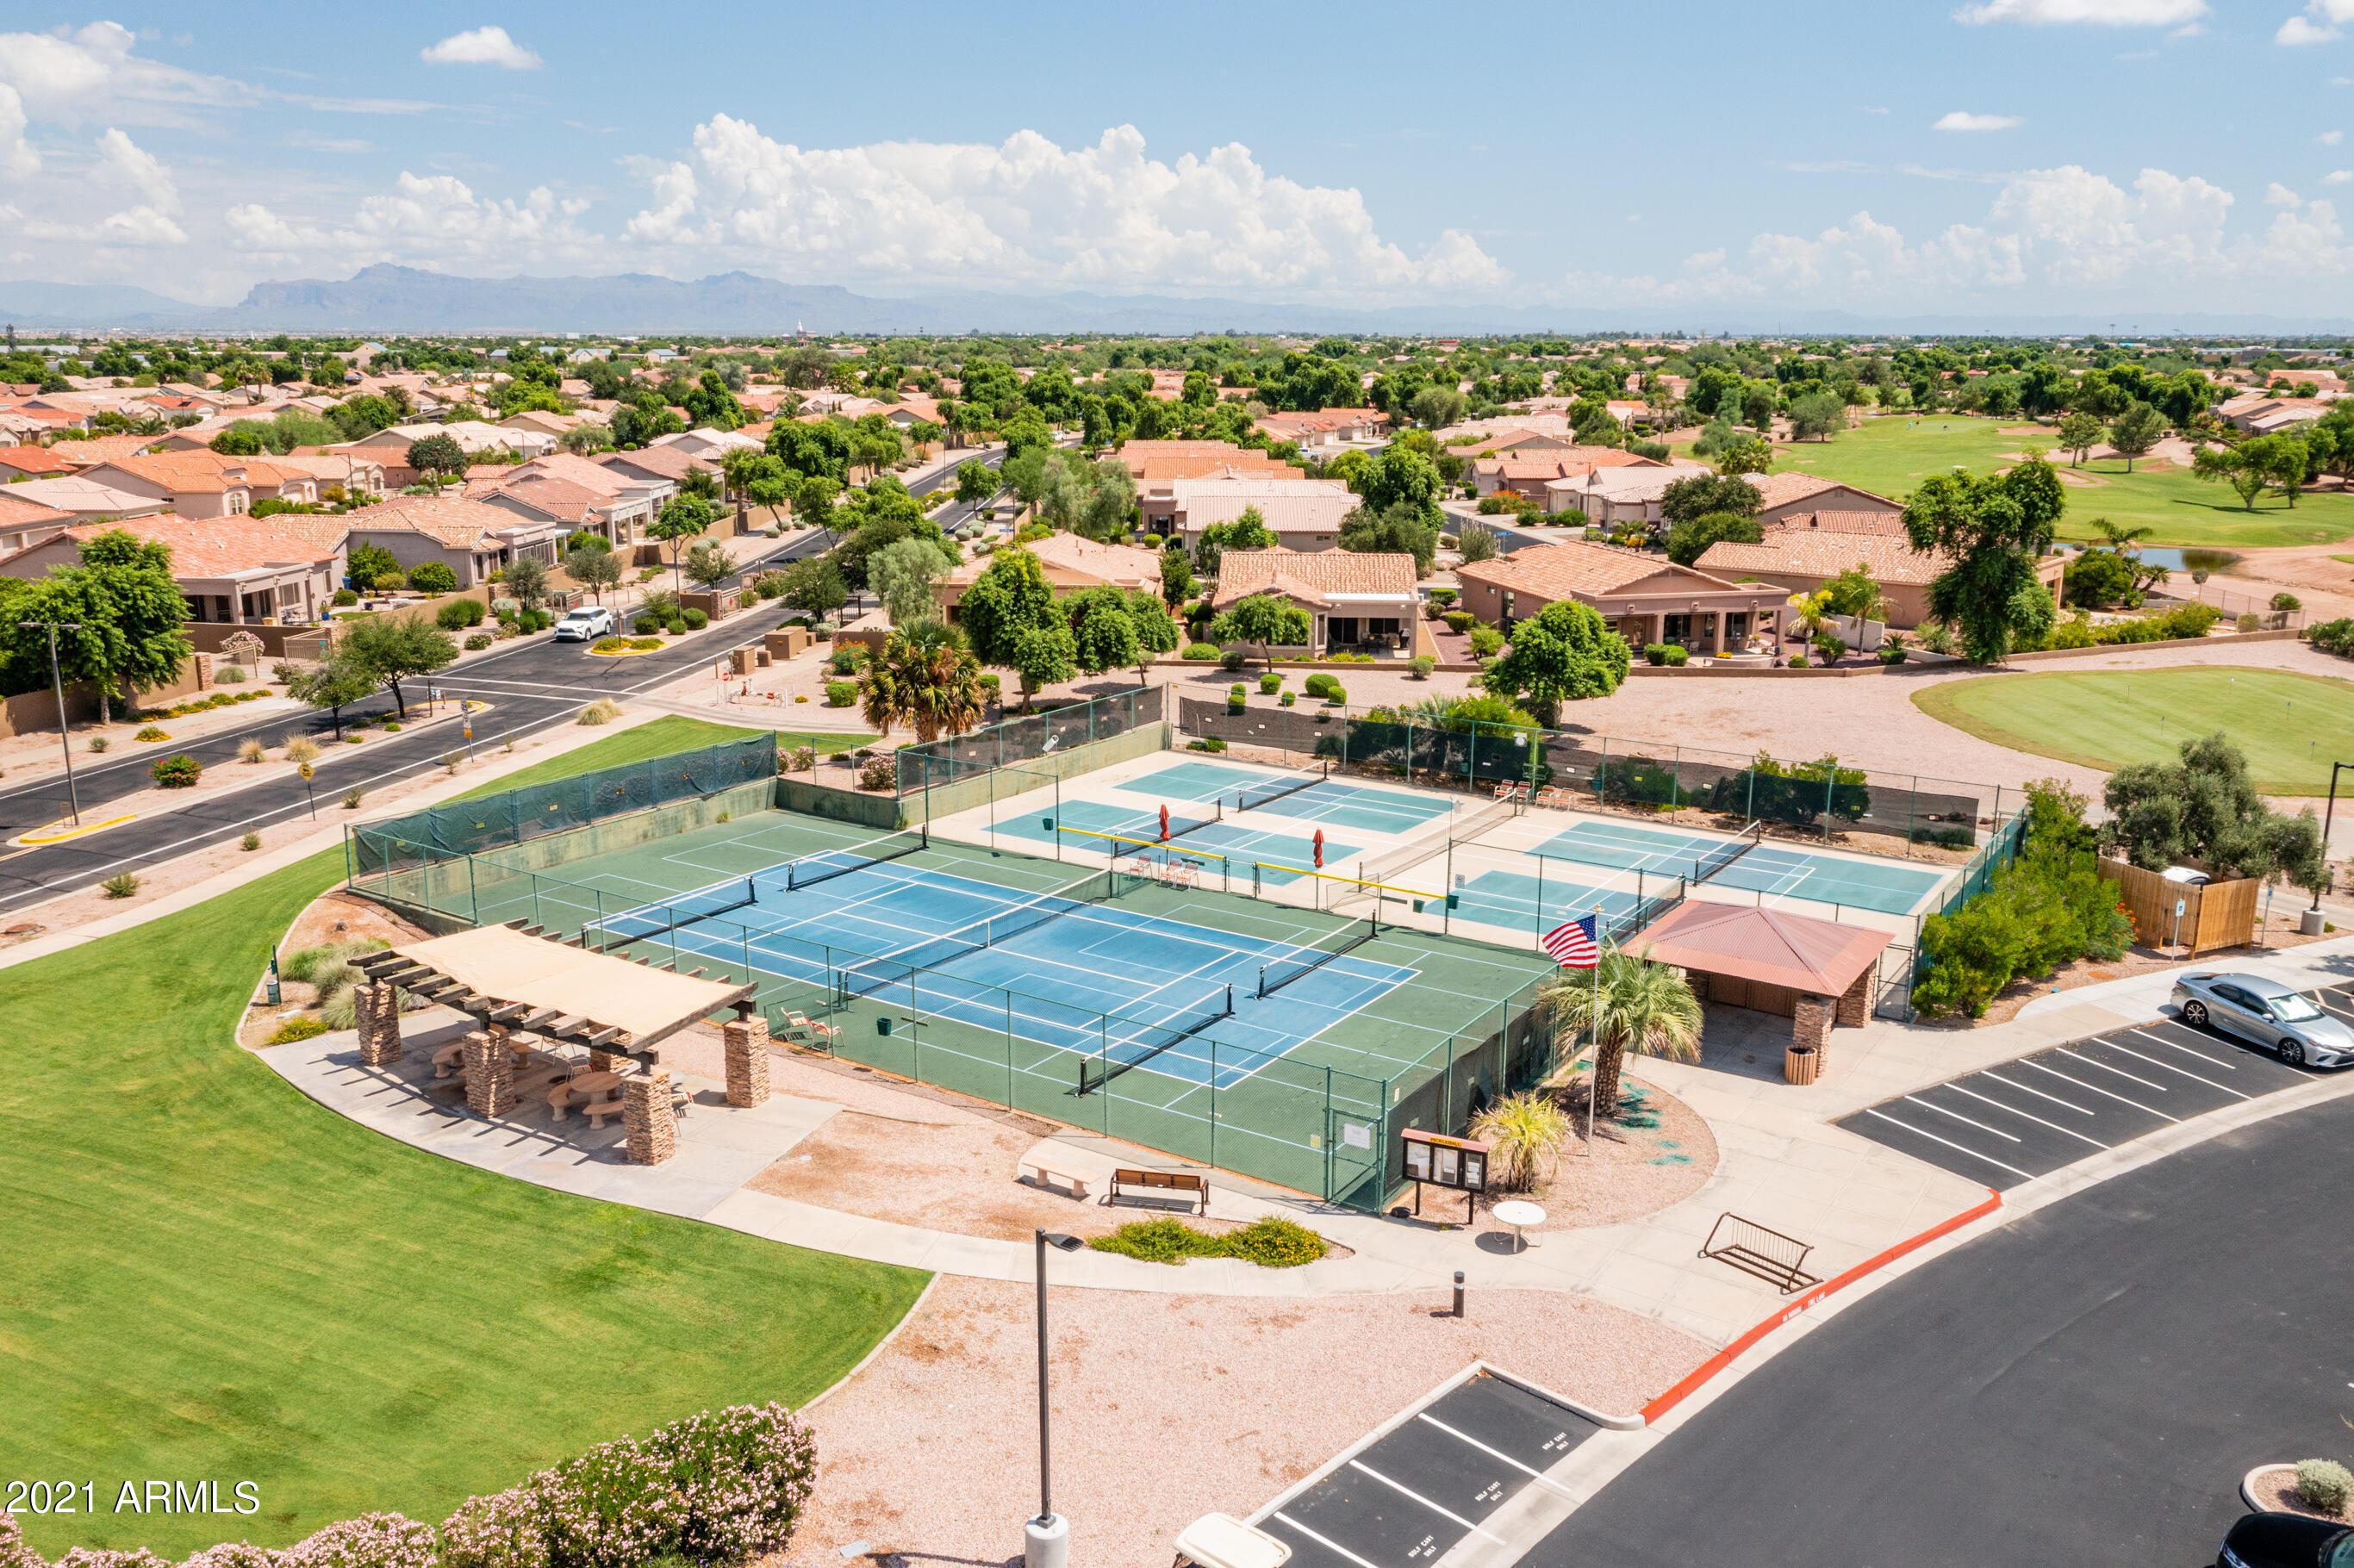 MLS 6310842 4492 E CAROB Drive, Gilbert, AZ 85298 Gilbert AZ Trilogy At Power Ranch